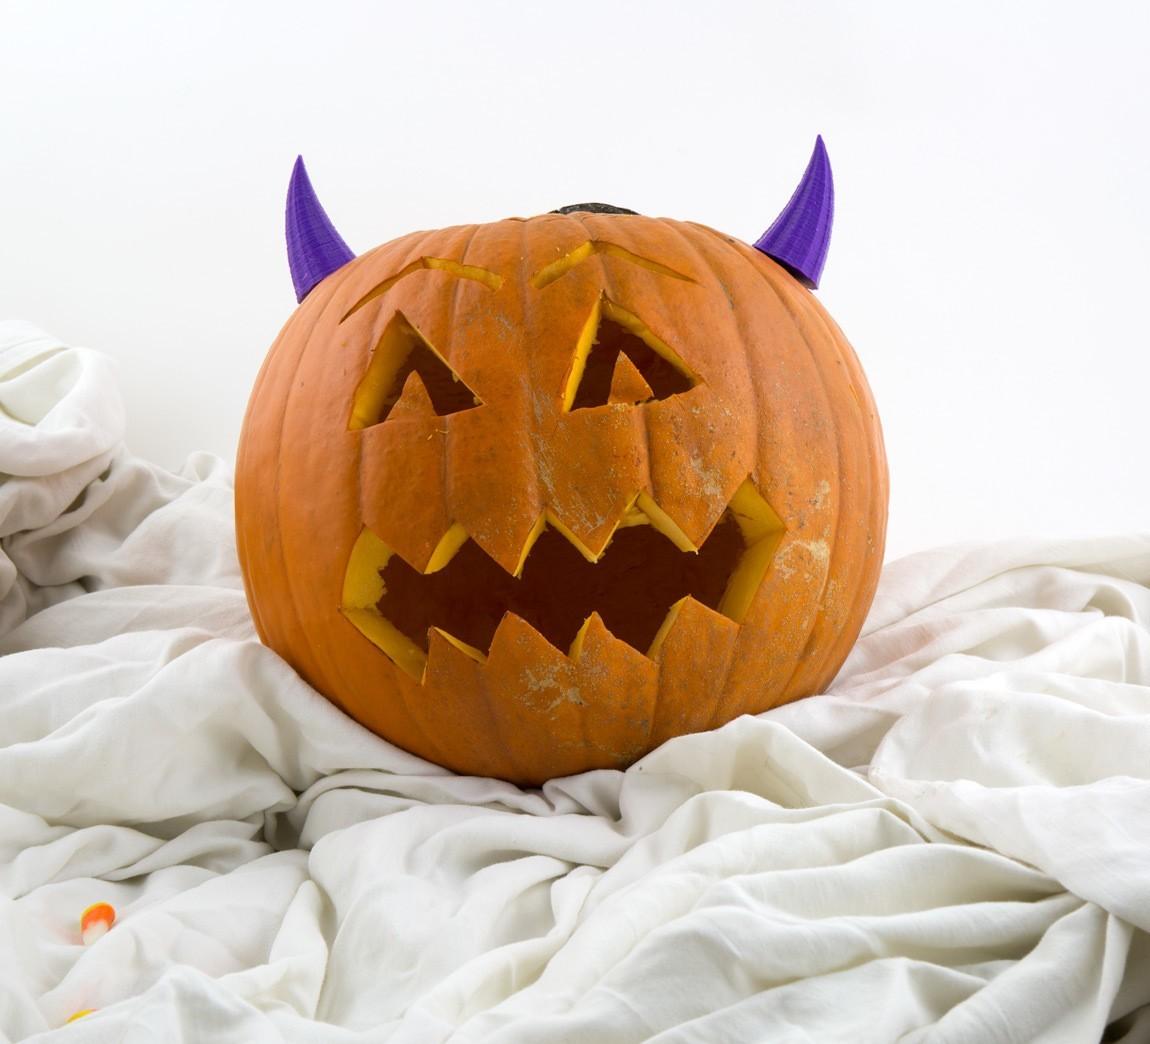 dfddc7458b3bfd7e08034c888a0ce130_1445642370311_NMD000620d.jpg Download free STL file Pumpkin Devil • 3D printing template, Hom3d